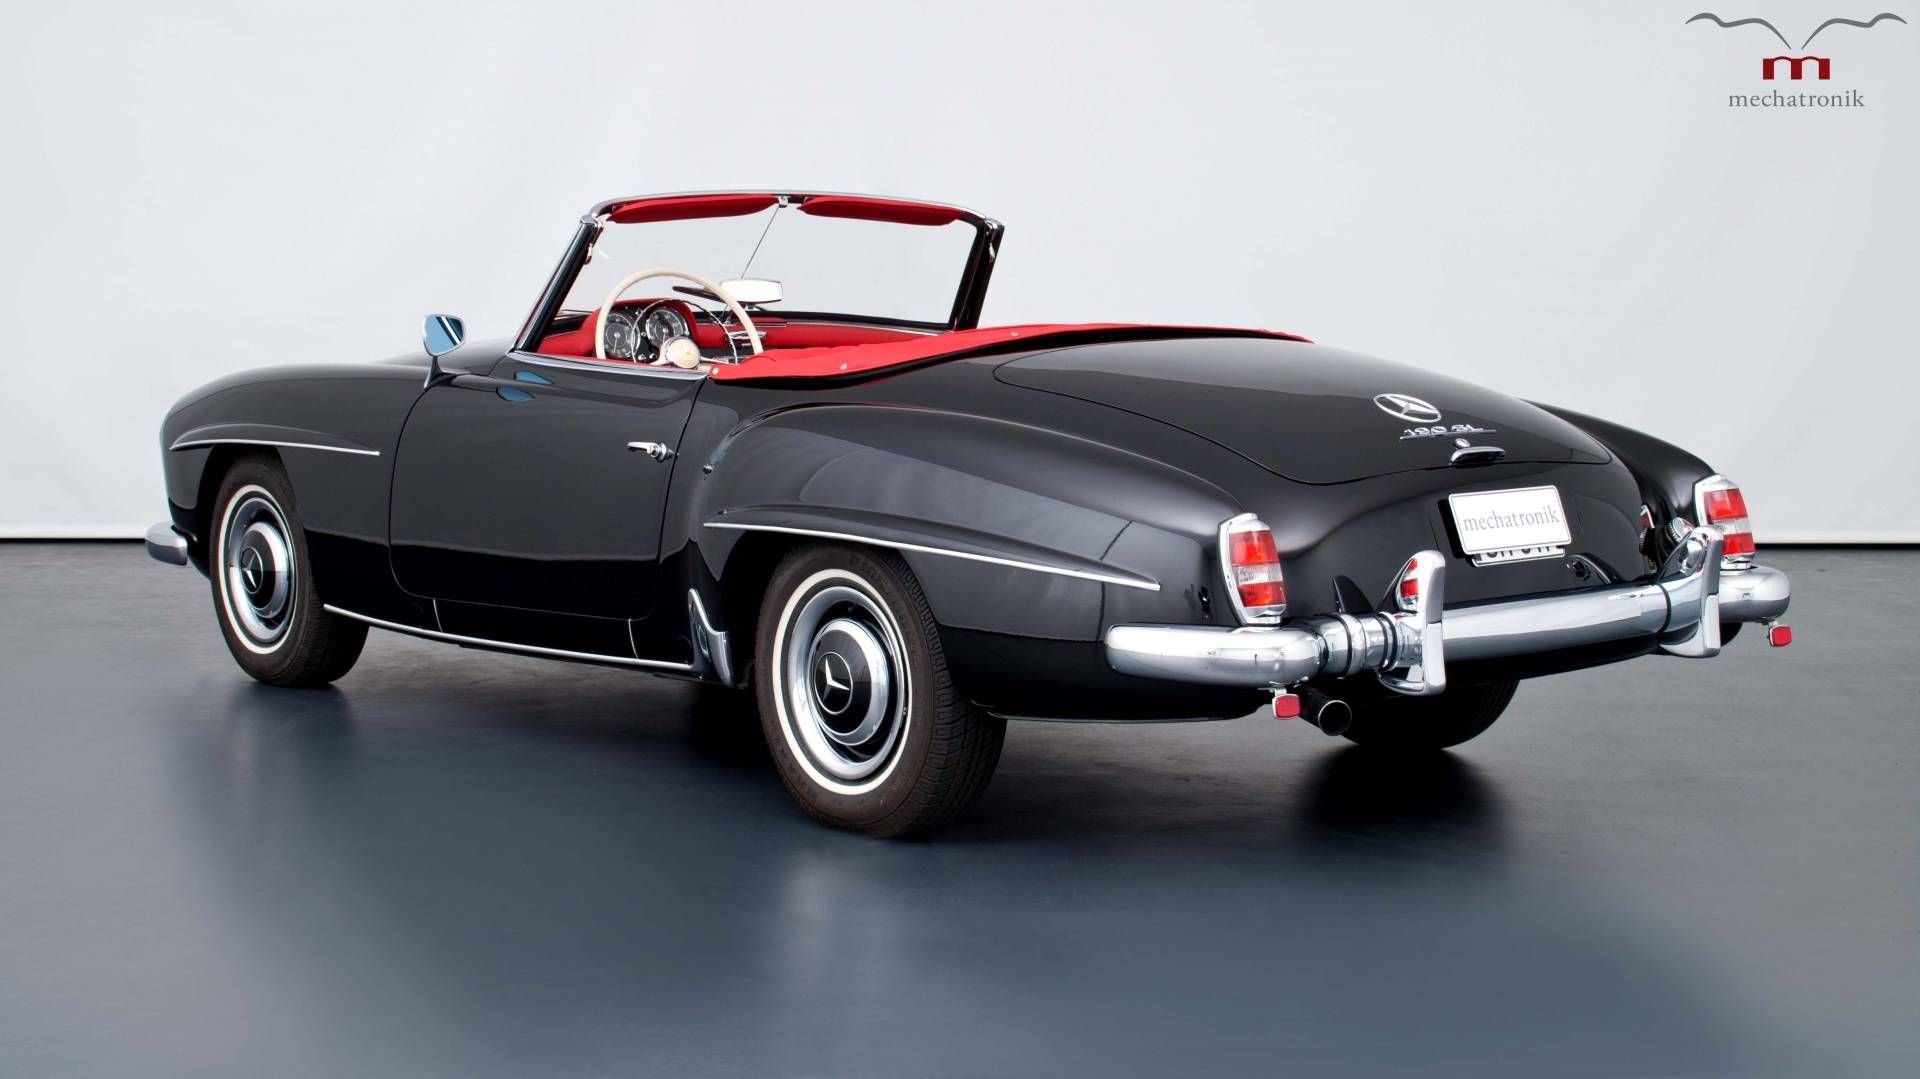 Mercedes-Benz 190 SL -1961 | Mercedes | Pinterest | Mercedes benz ...